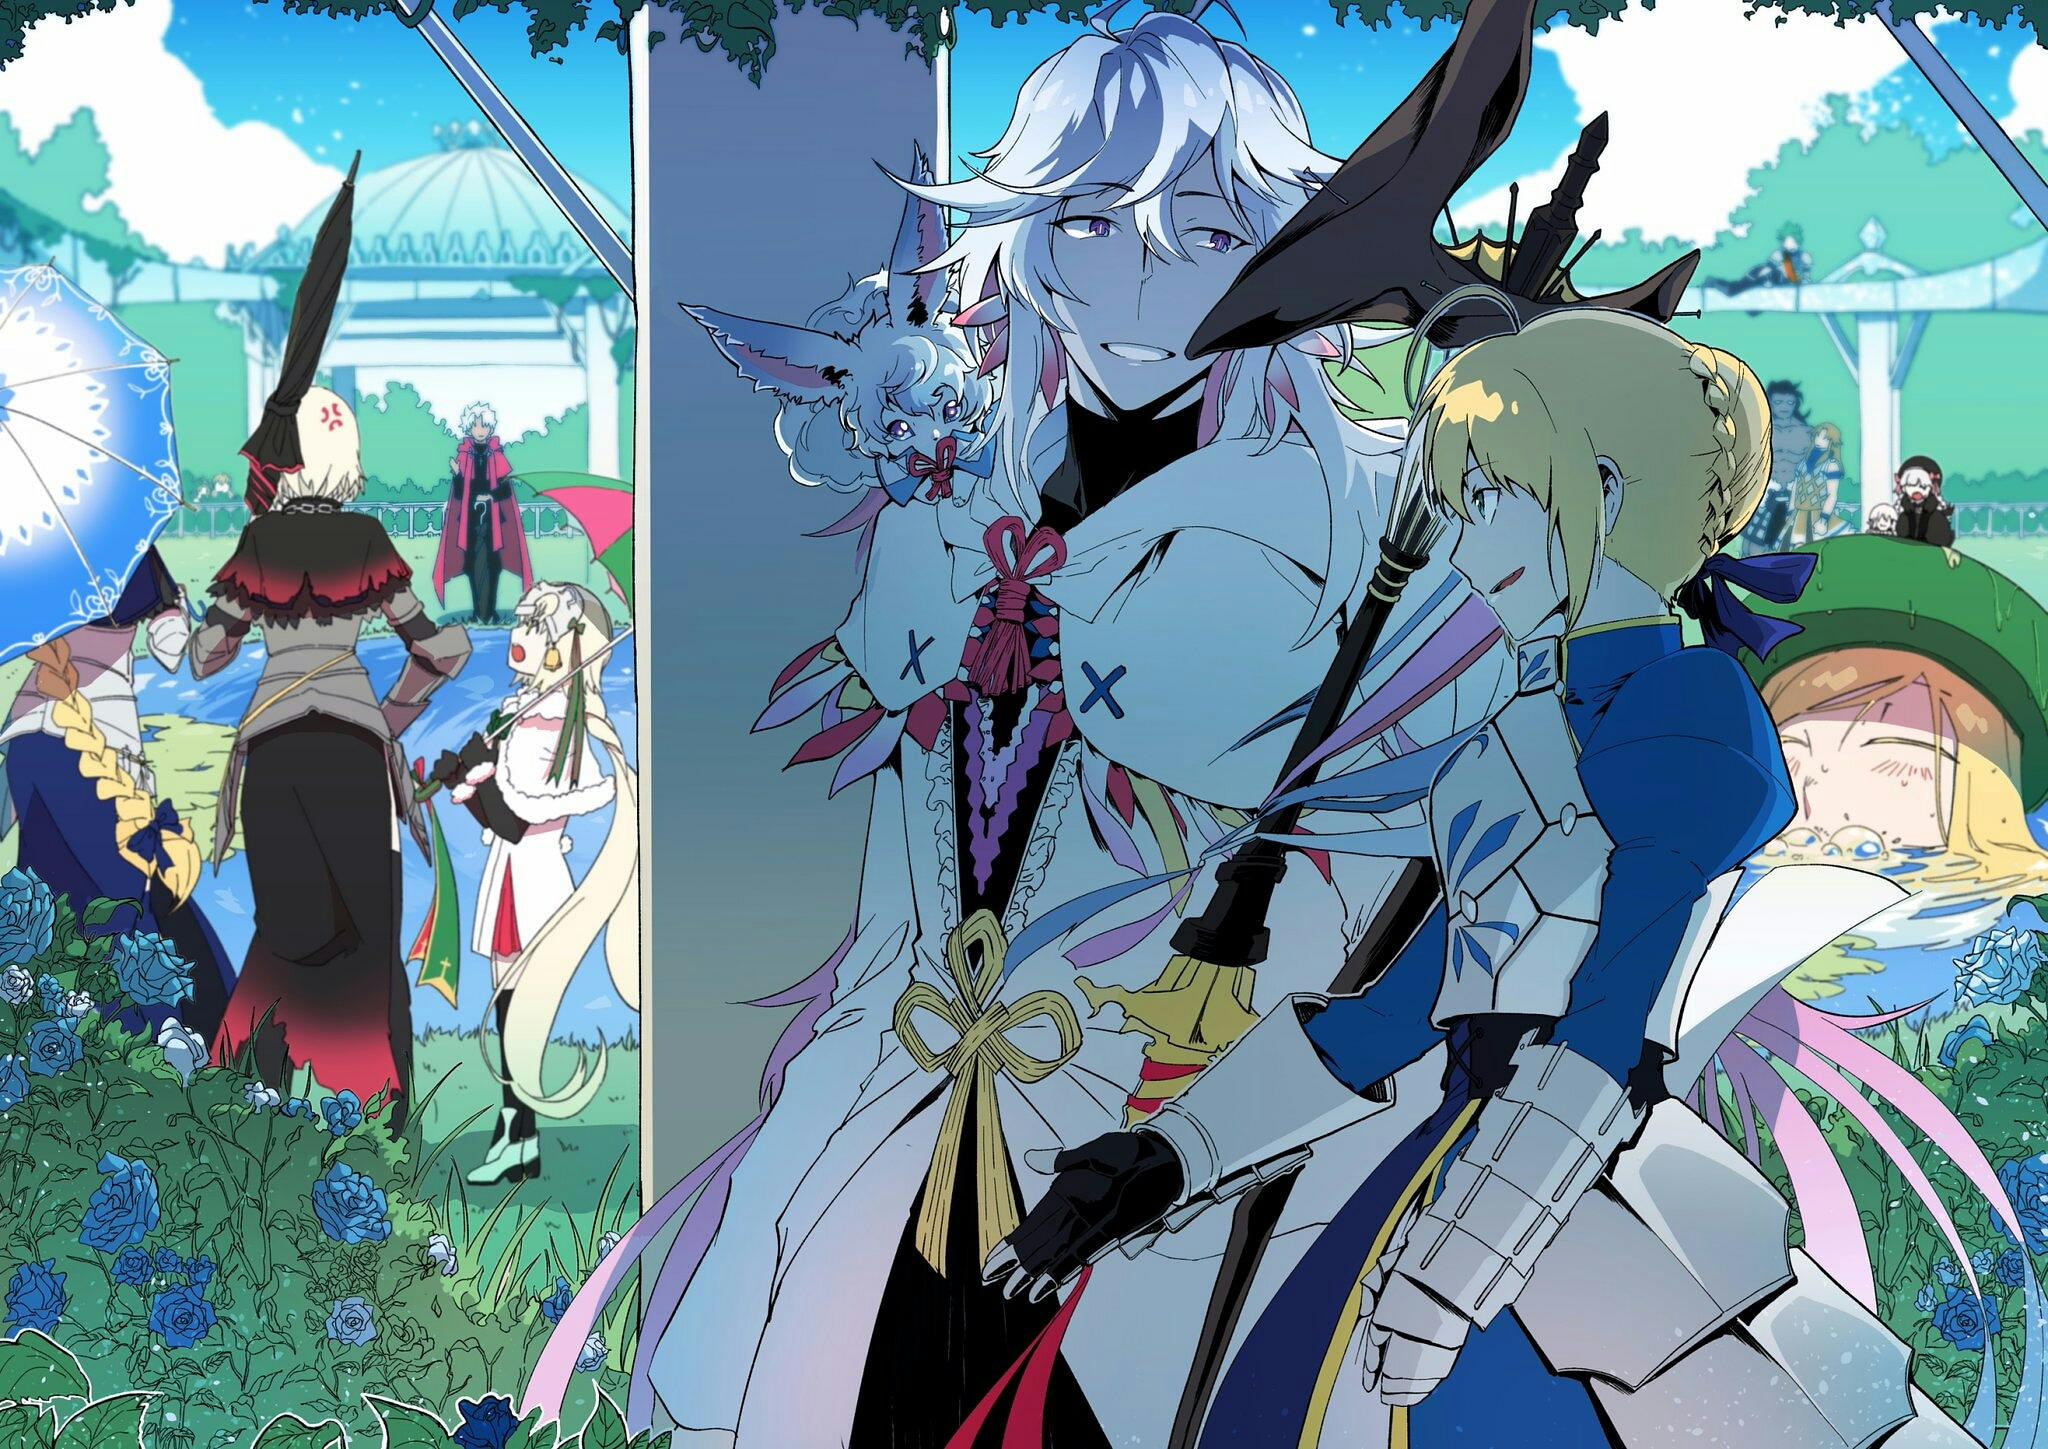 Fate/Grand Order Image #2334796 - Zerochan Anime Image Board